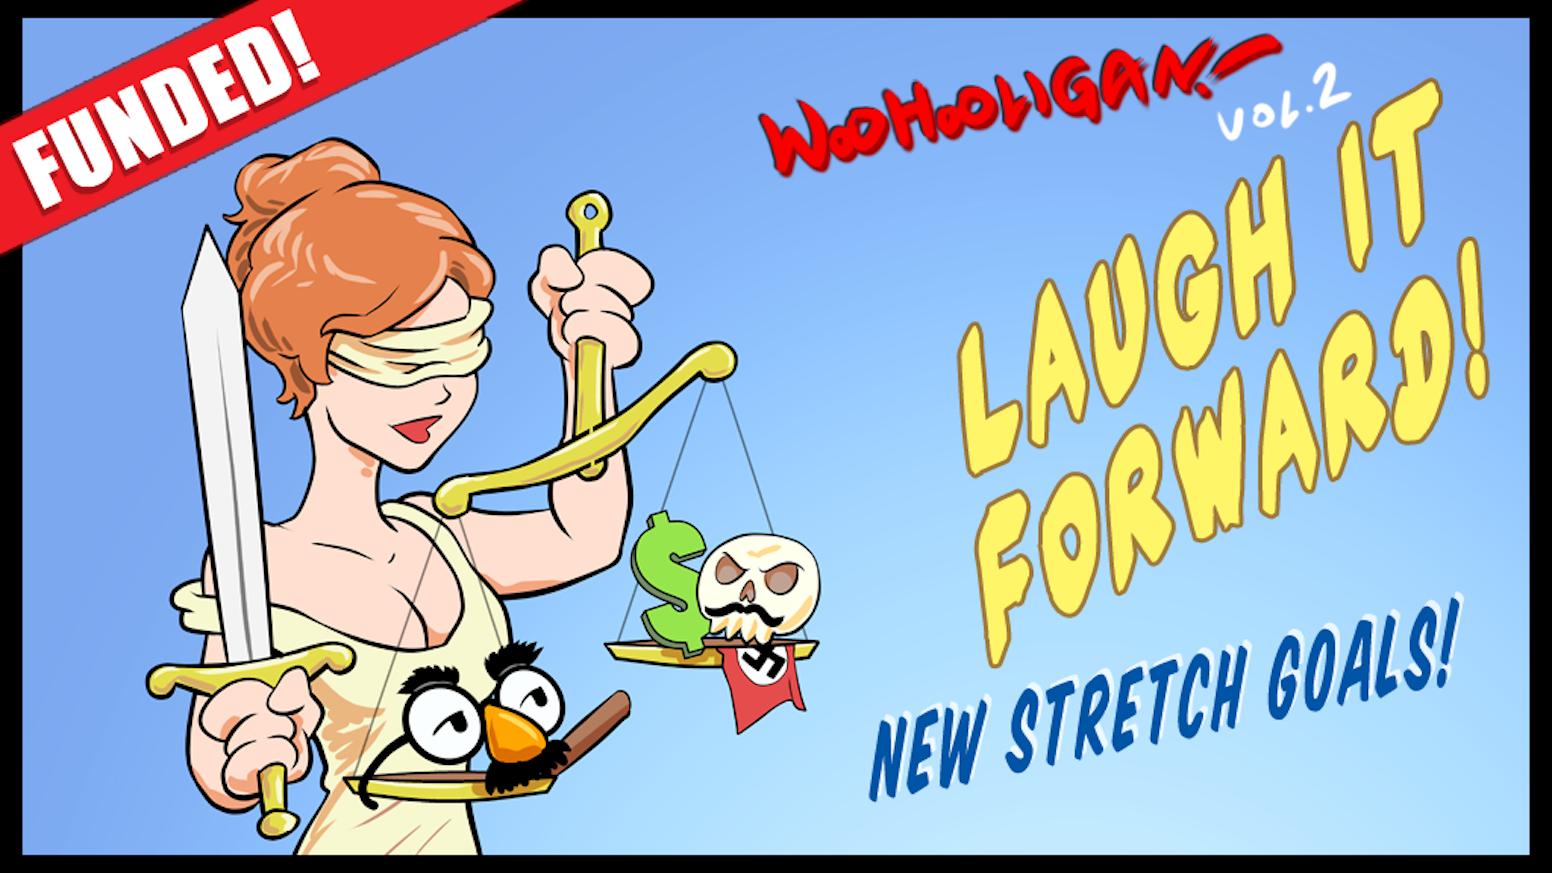 Woohooligan Vol 2 Laugh It Forward Jokes For Justice By Sam